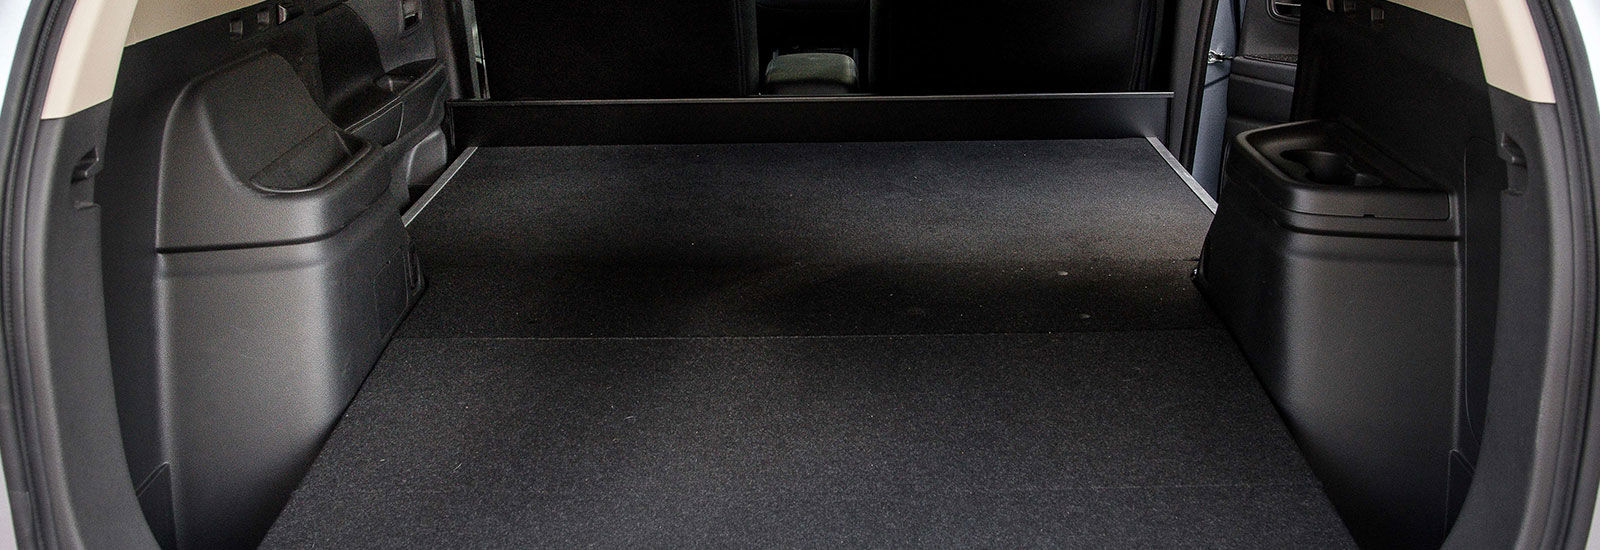 Mitsubishi outlander phev sizes dimensions carwow for Mitsubishi outlander interior dimensions